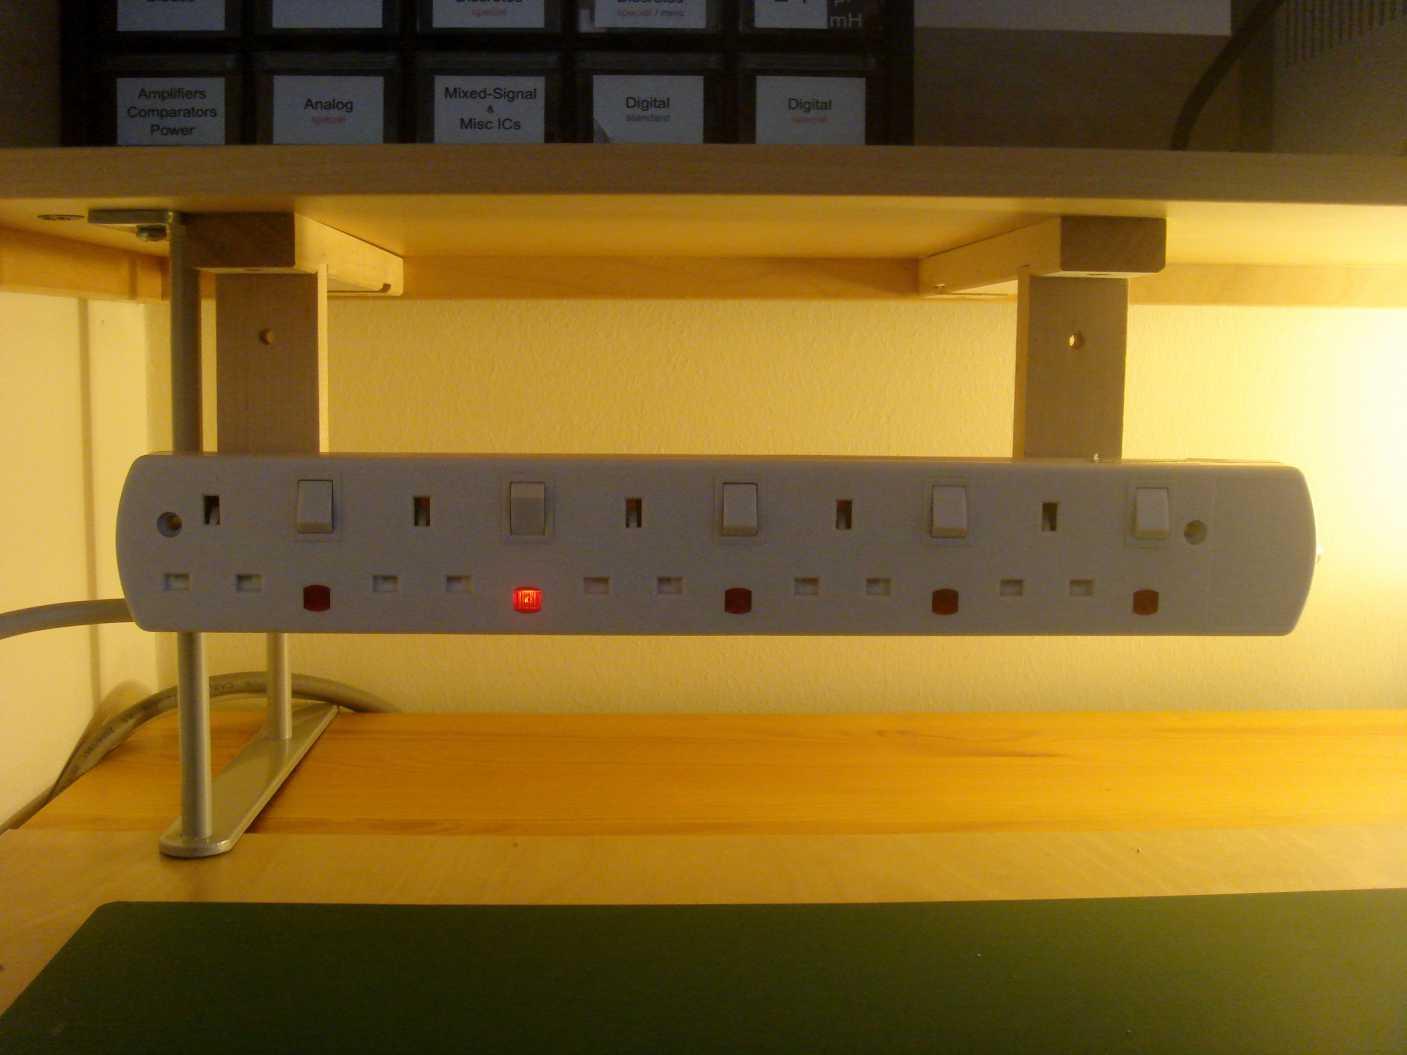 Desk Mount Power Strip Hostgarcia